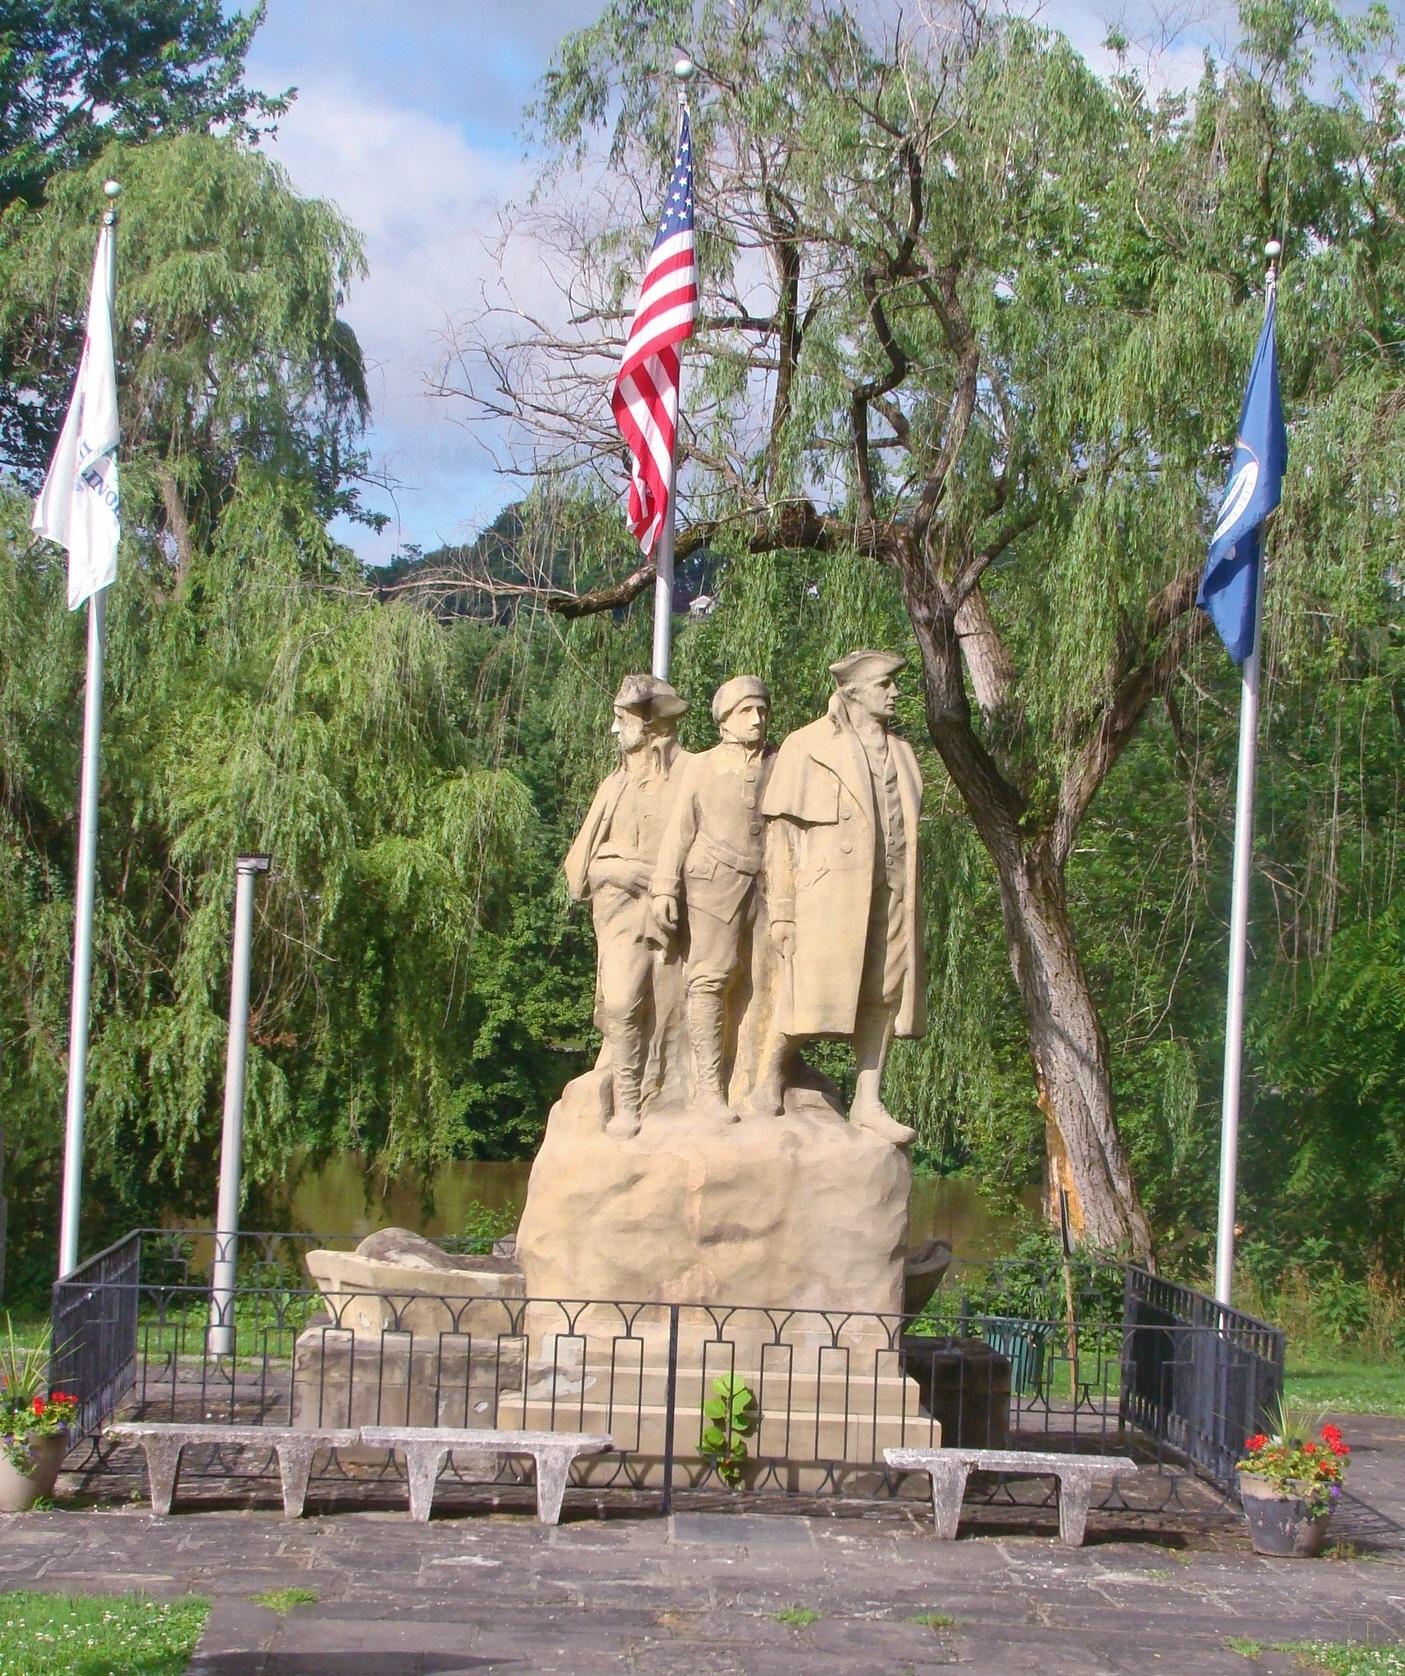 Westward Monument